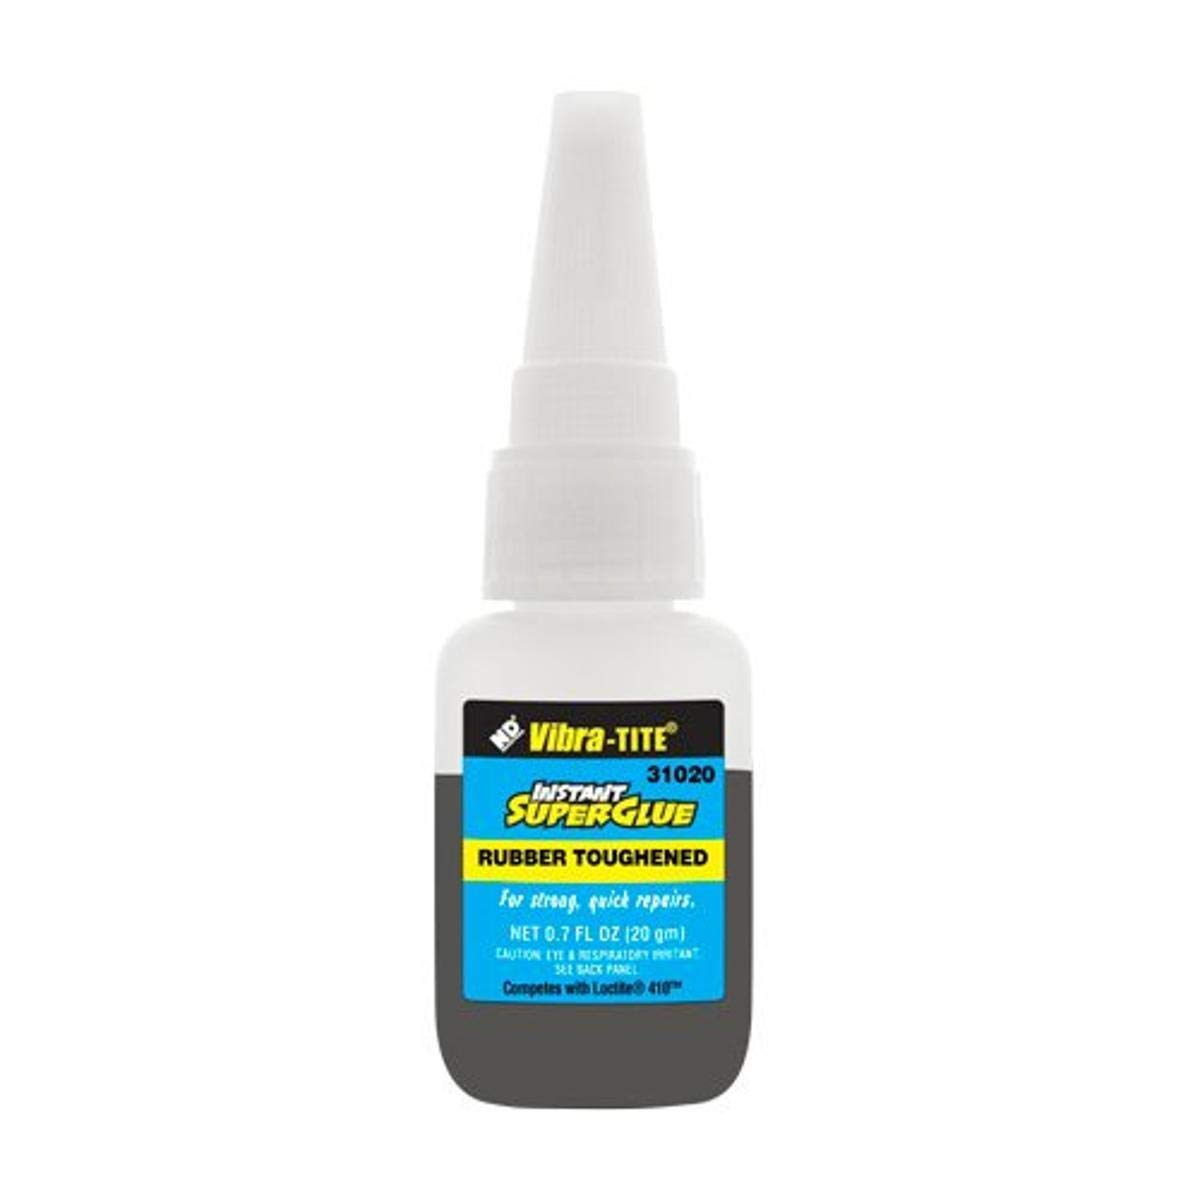 Vibra-TITE - 31020 310 Toughened Superglue: Gap Filling Black - 20 gm bottle